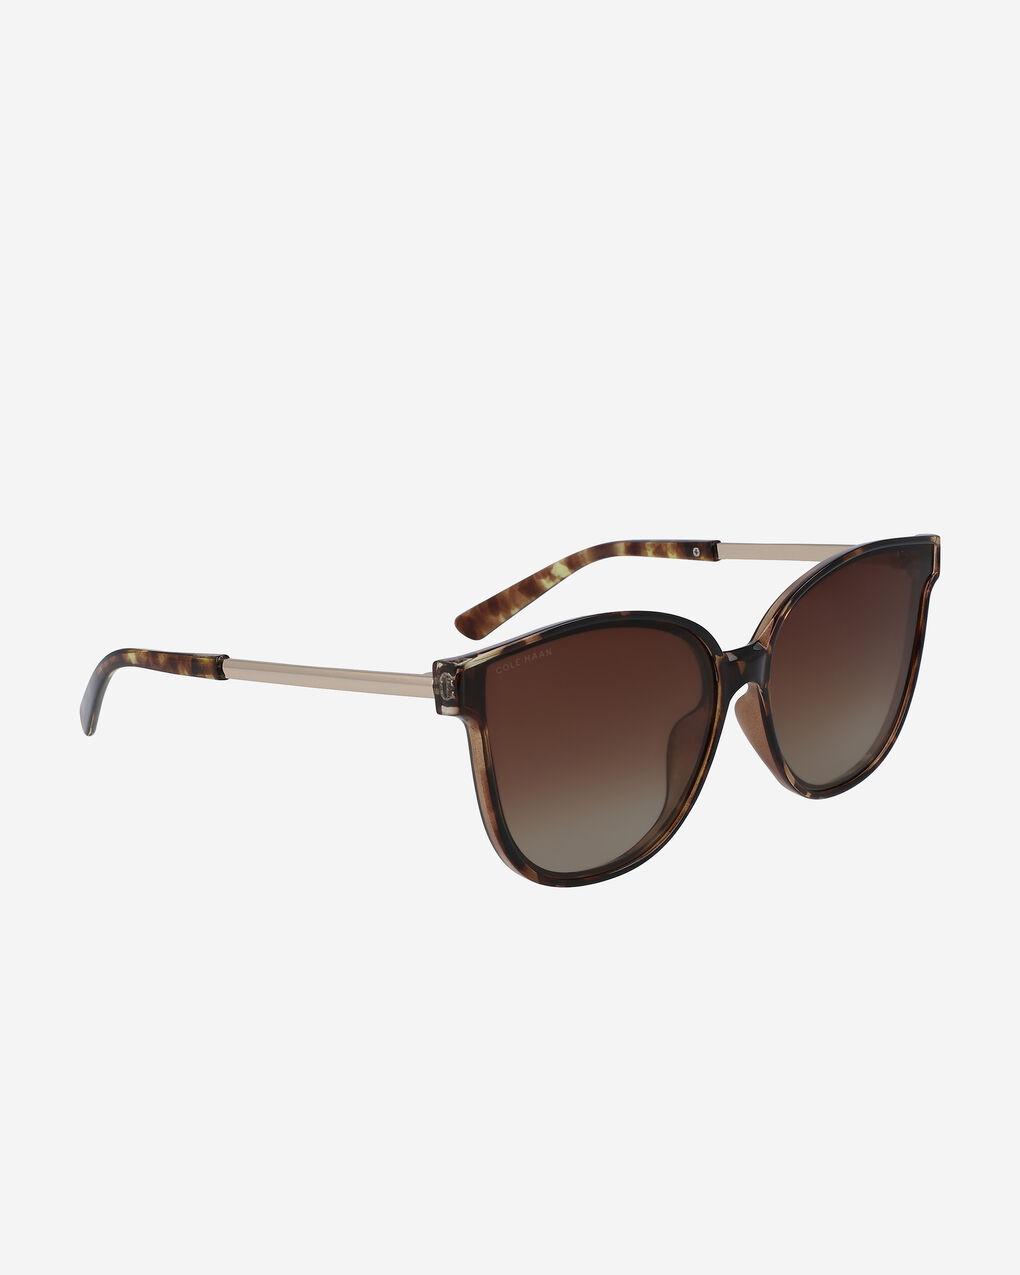 WOMENS Flat Lens Oversized Cateye Sunglasses